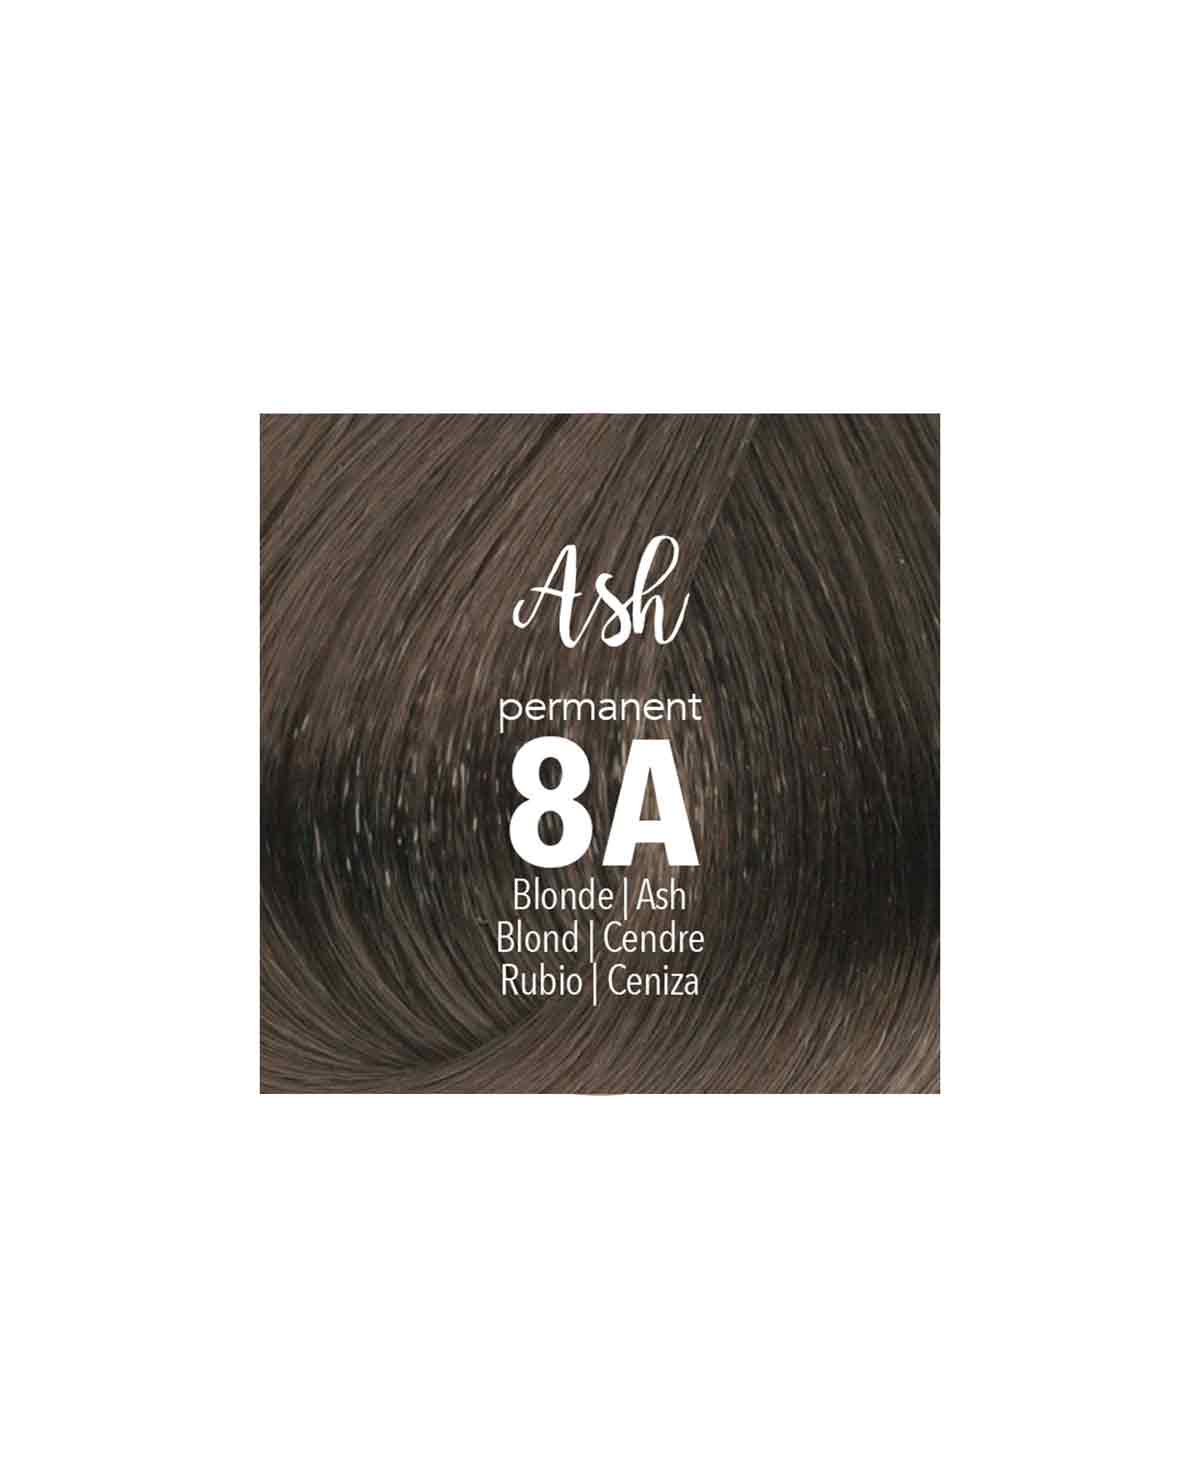 Mydentity - 8A Blonde Ash